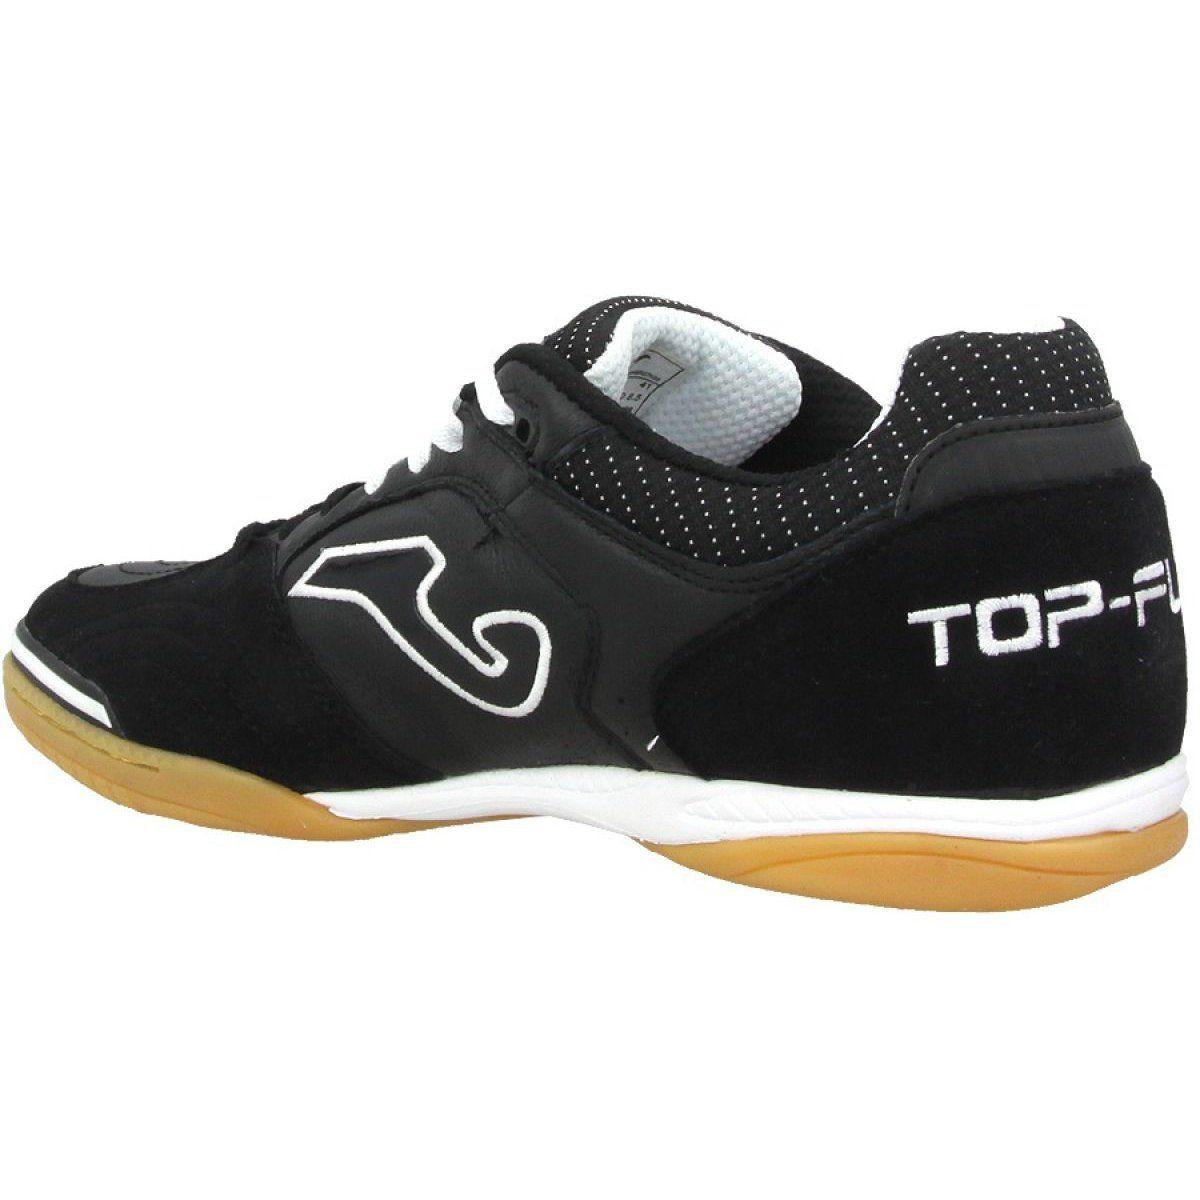 Buty Halowe Joma Top Flex Topw 301 Ps Czarne Czarne Indoor Shoe Joma Sport Shoes